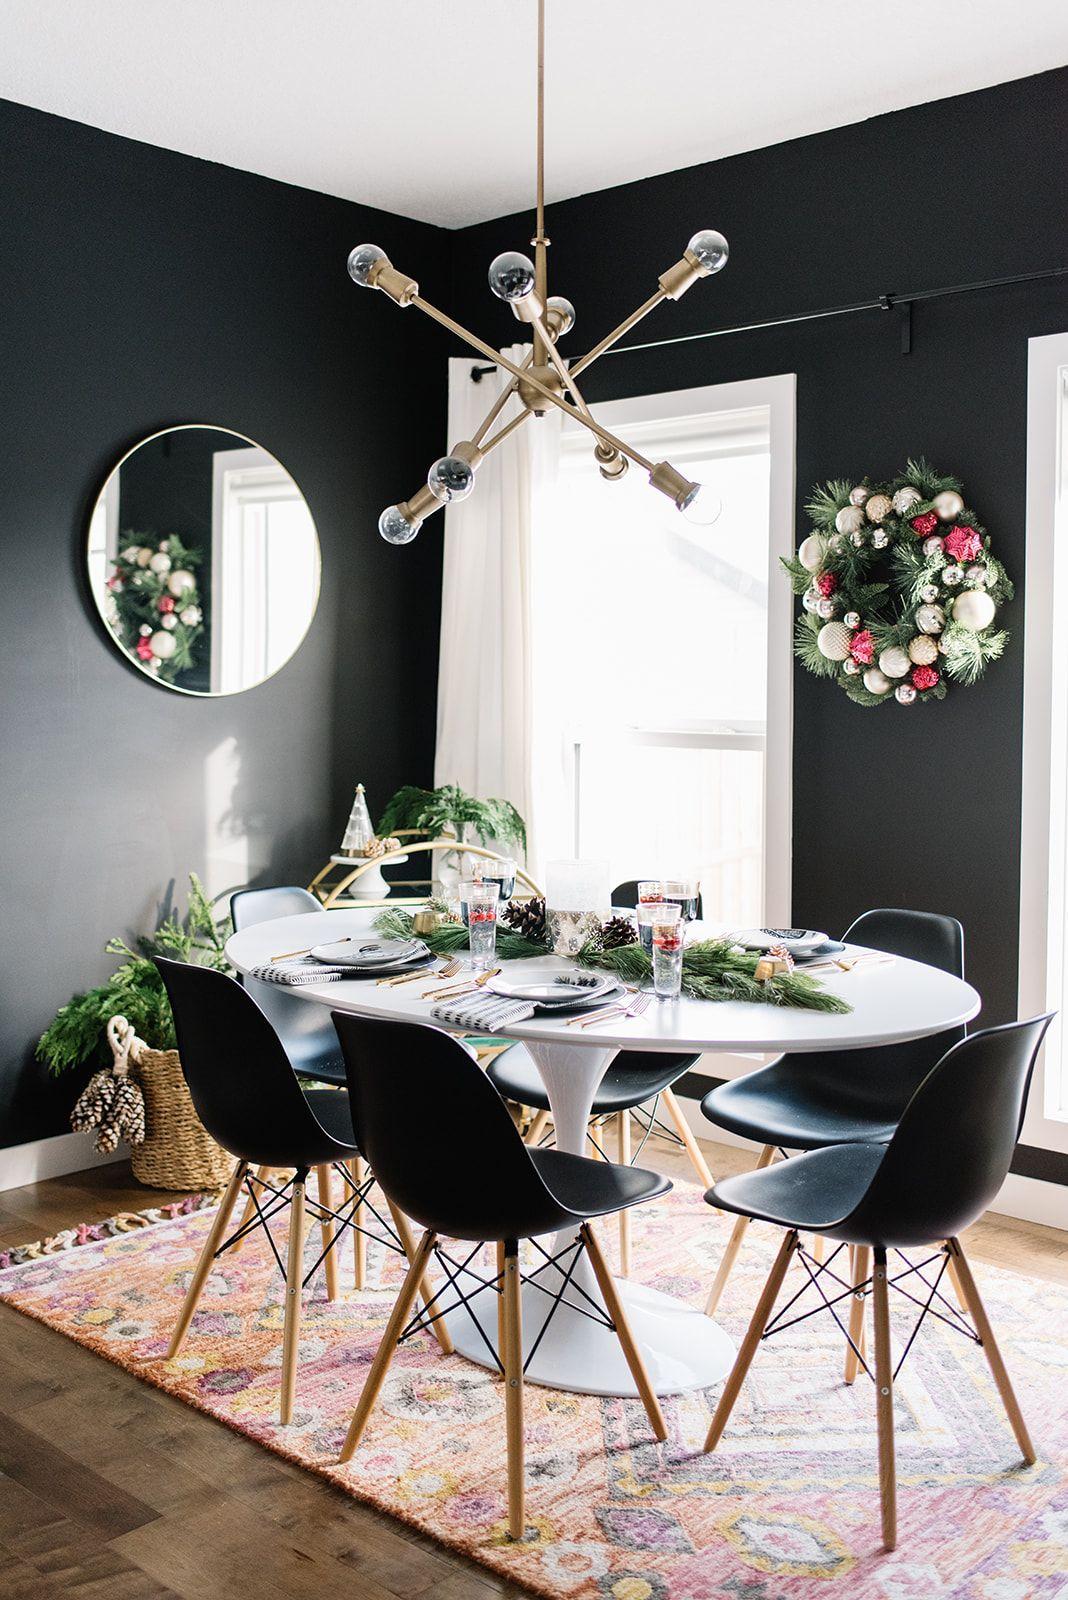 Modern black dining room also demystifier mythes en deco interior design ideas home decor rh br pinterest